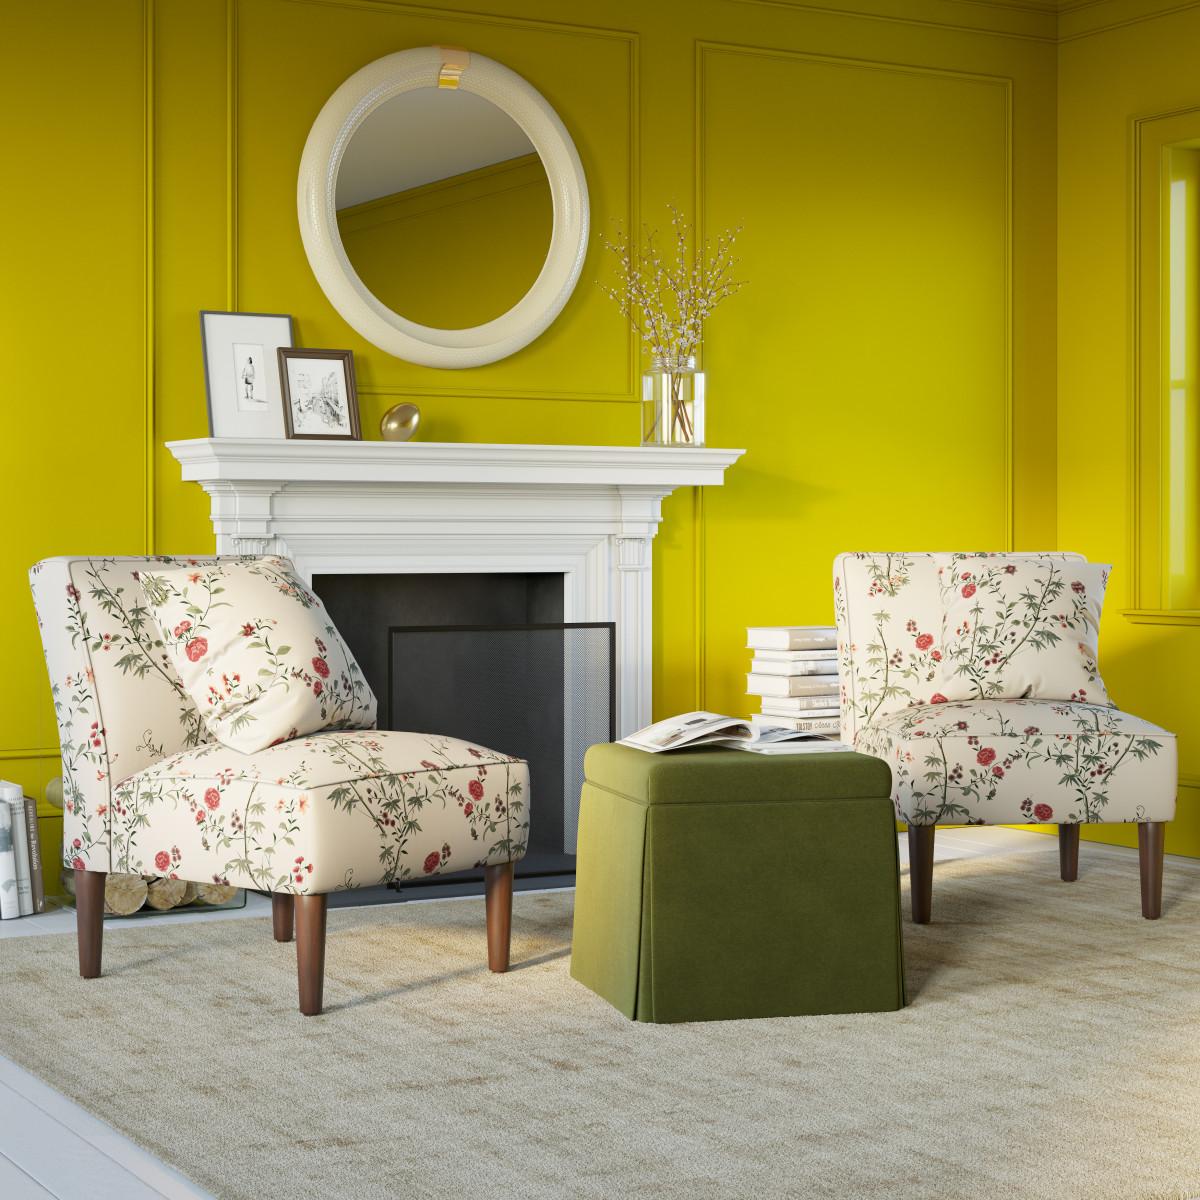 Enjoyable Skirted Storage Ottoman Yellow Zebra Inzonedesignstudio Interior Chair Design Inzonedesignstudiocom